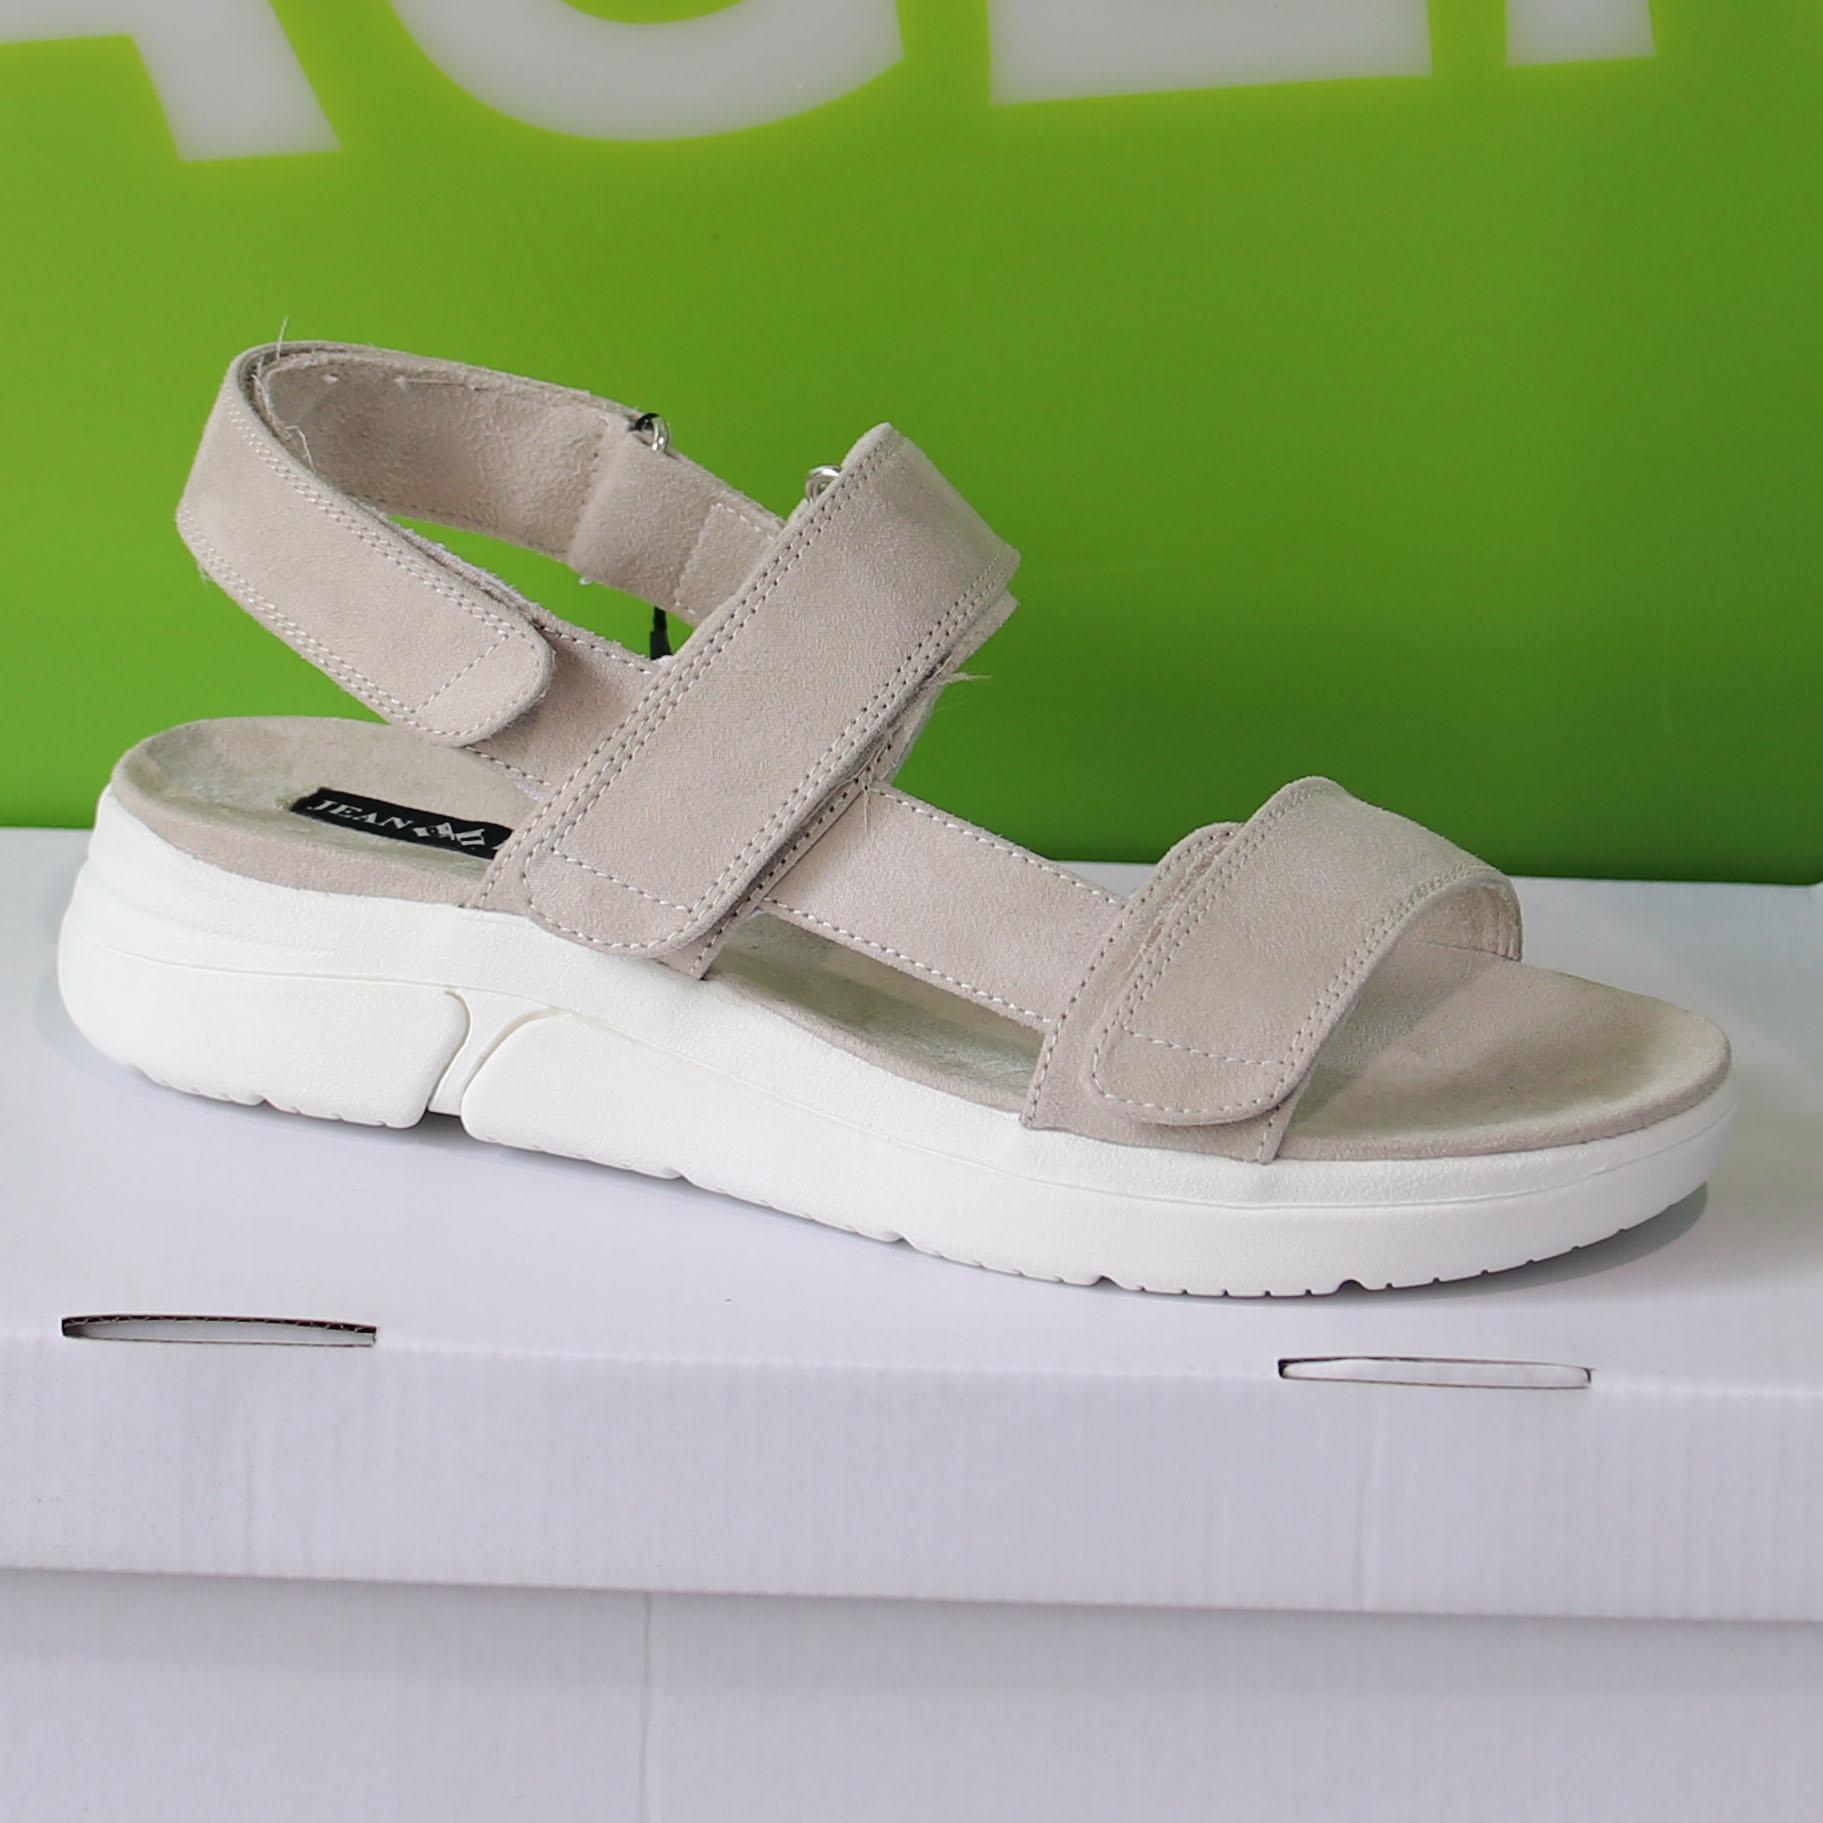 jean paul – vecchio sommersko dame sandaler6